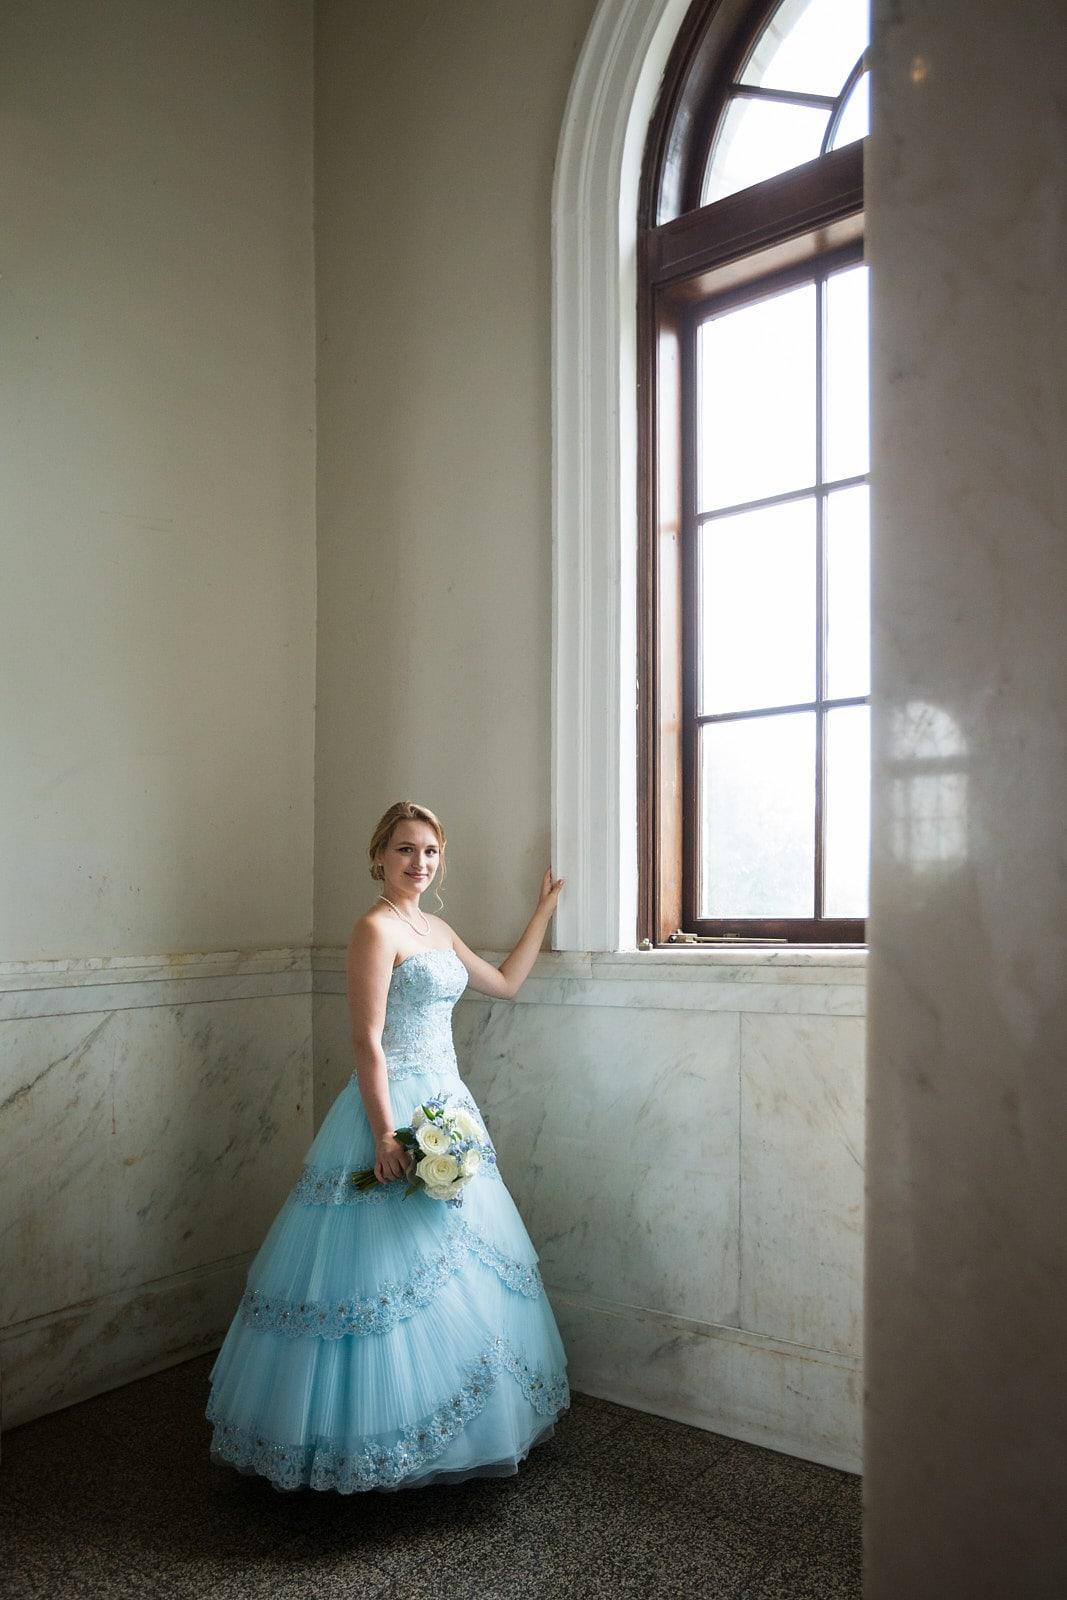 bridal portrait by window at Atlanta Historic Dekalb Courthouse wedding